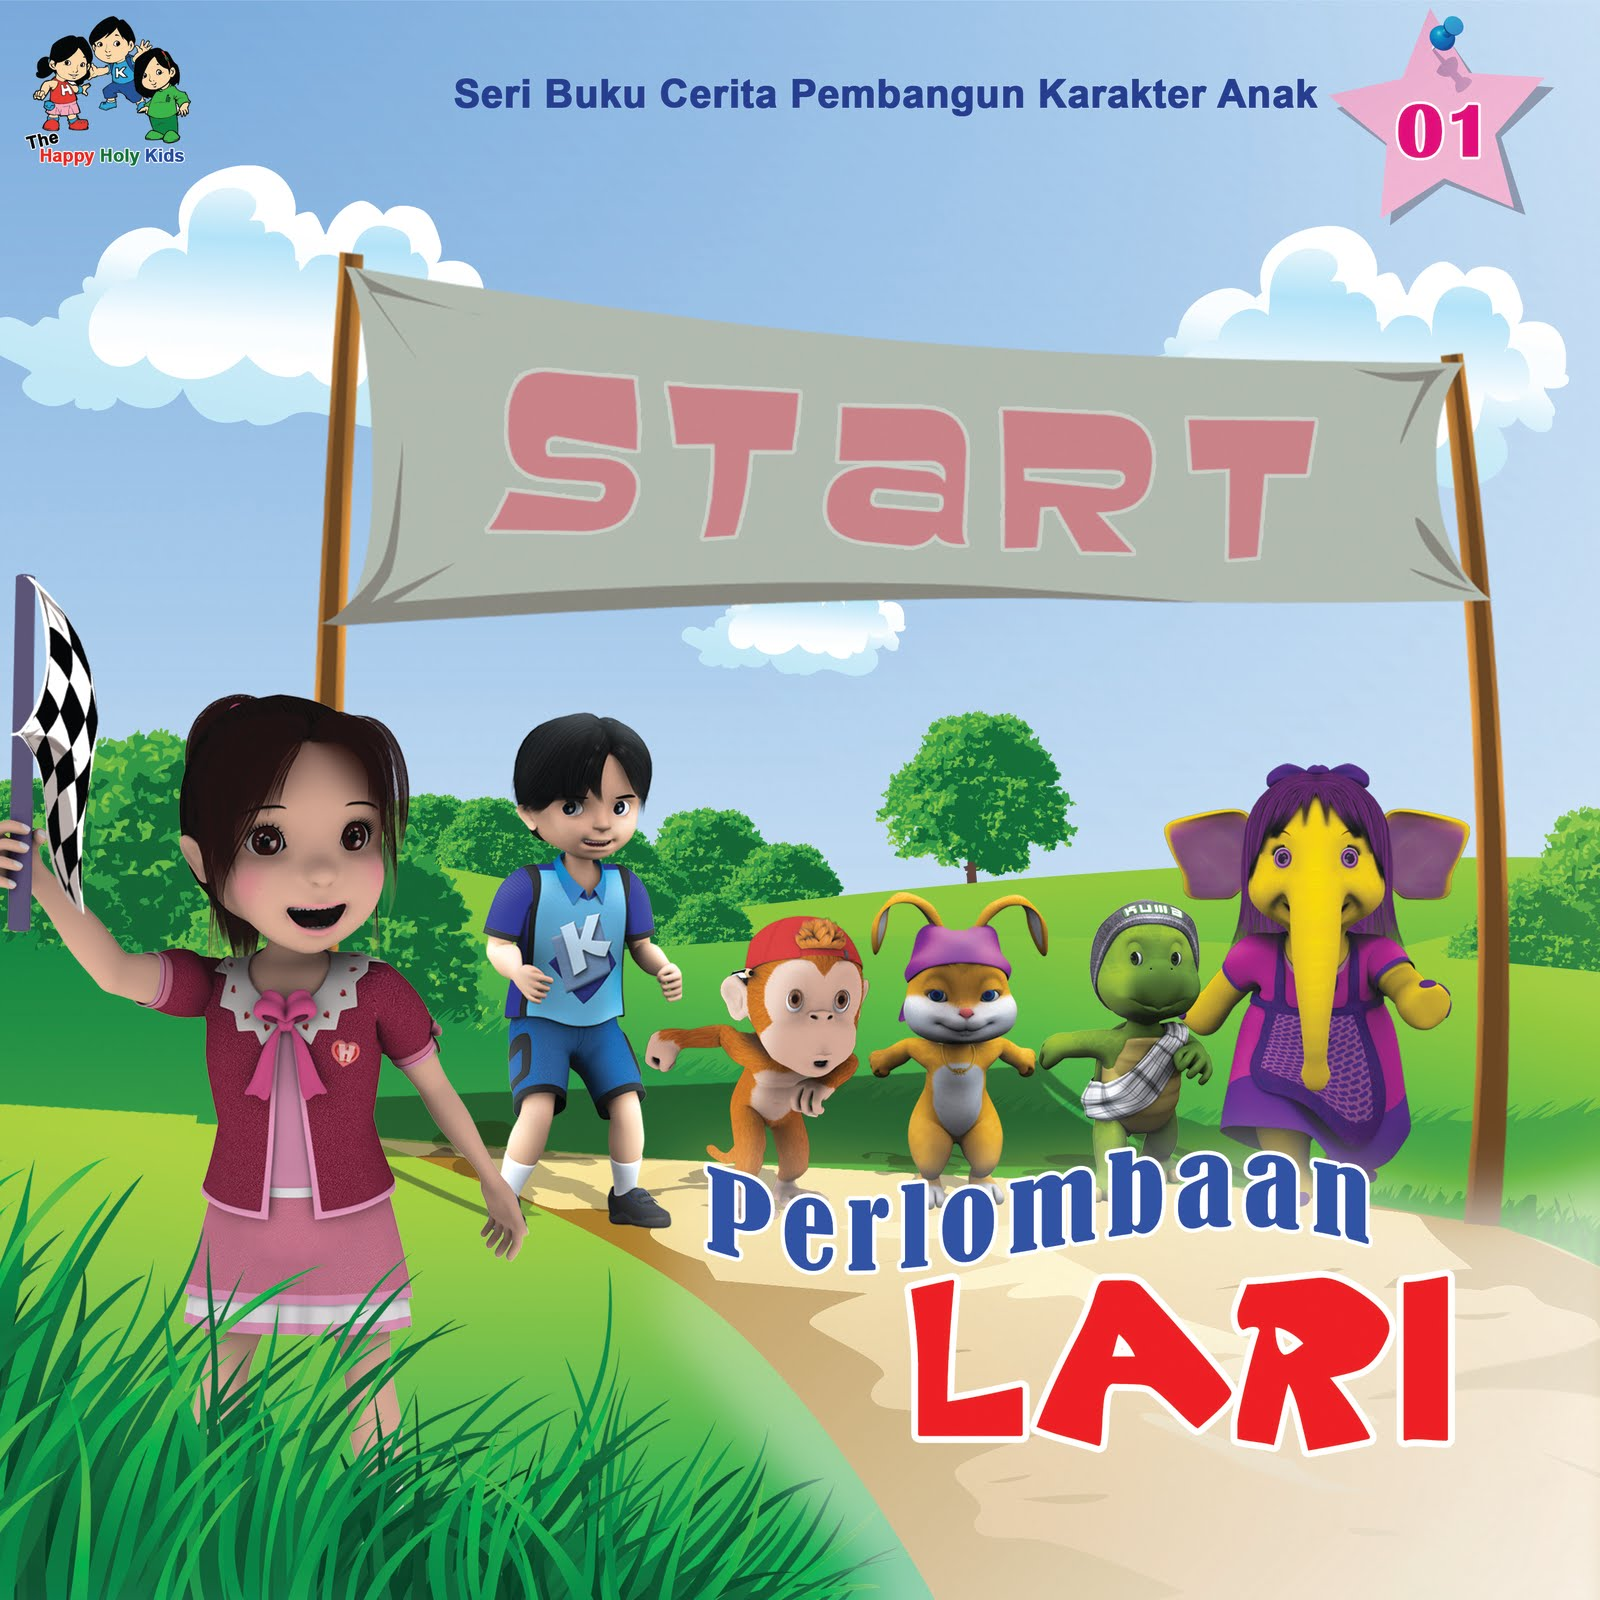 Animasi Animasi Buatan Indonesia Yang Keren Abis Yaelahcom